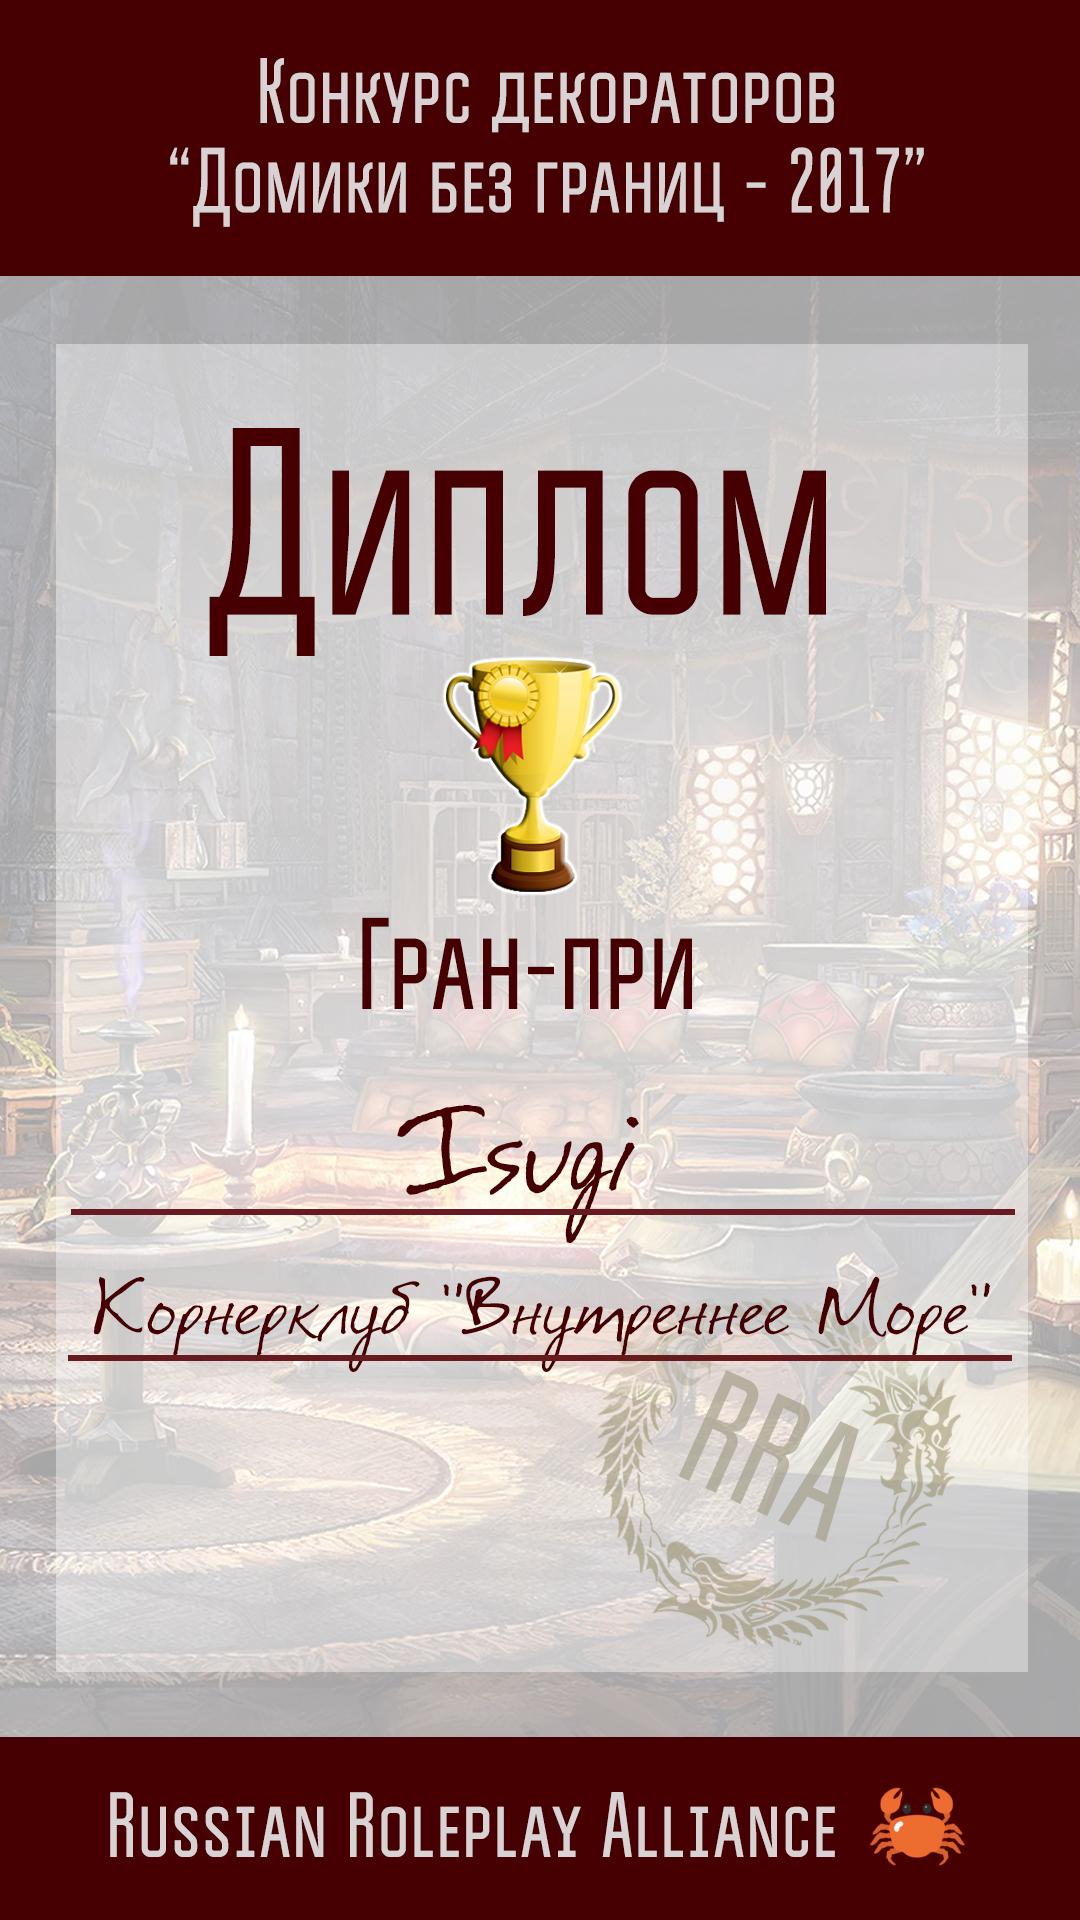 http://sf.uploads.ru/6ytng.jpg